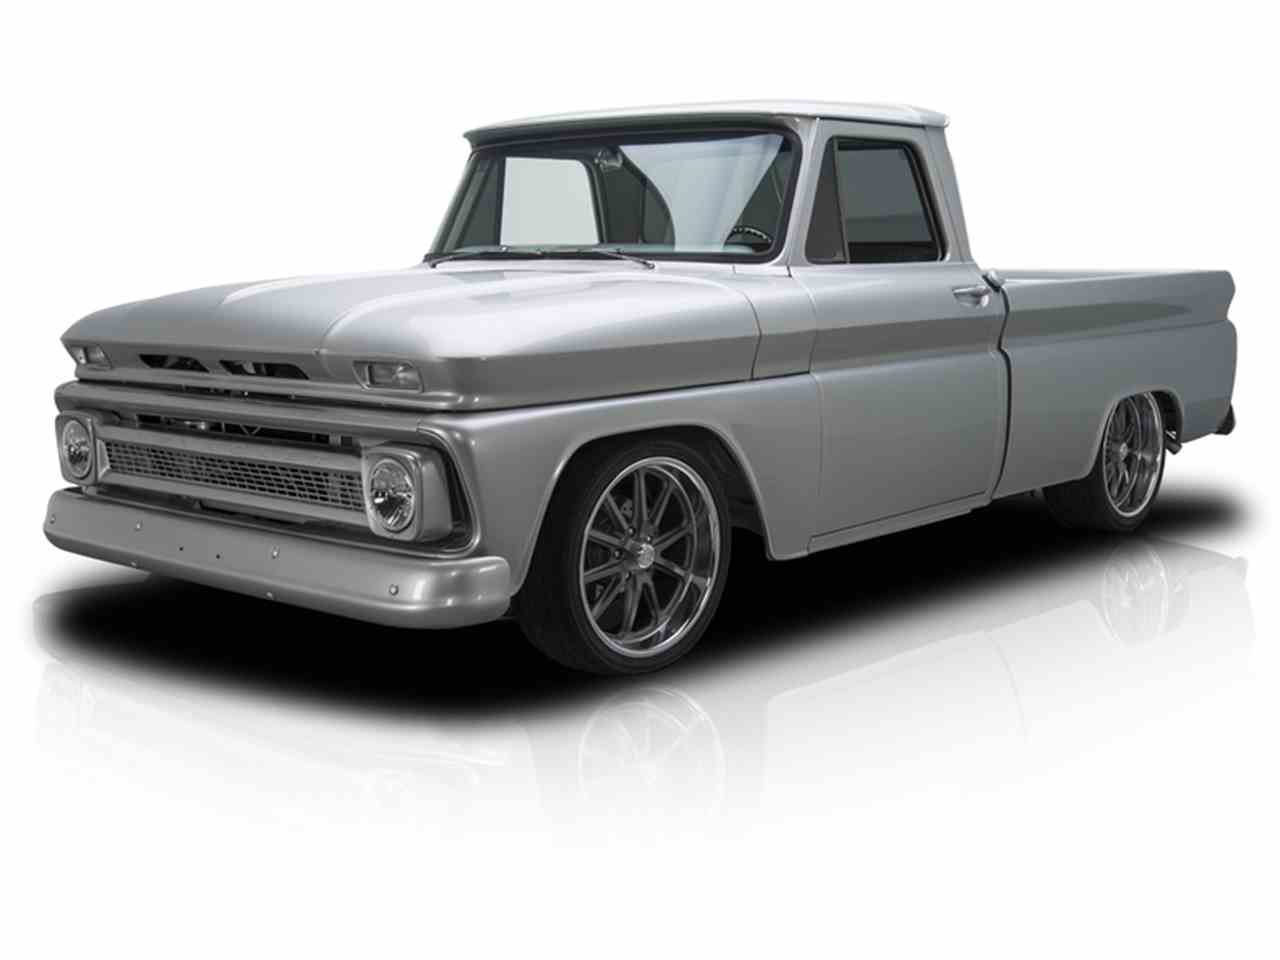 1965 Chevrolet C10 Apache Pickup Truck For Sale